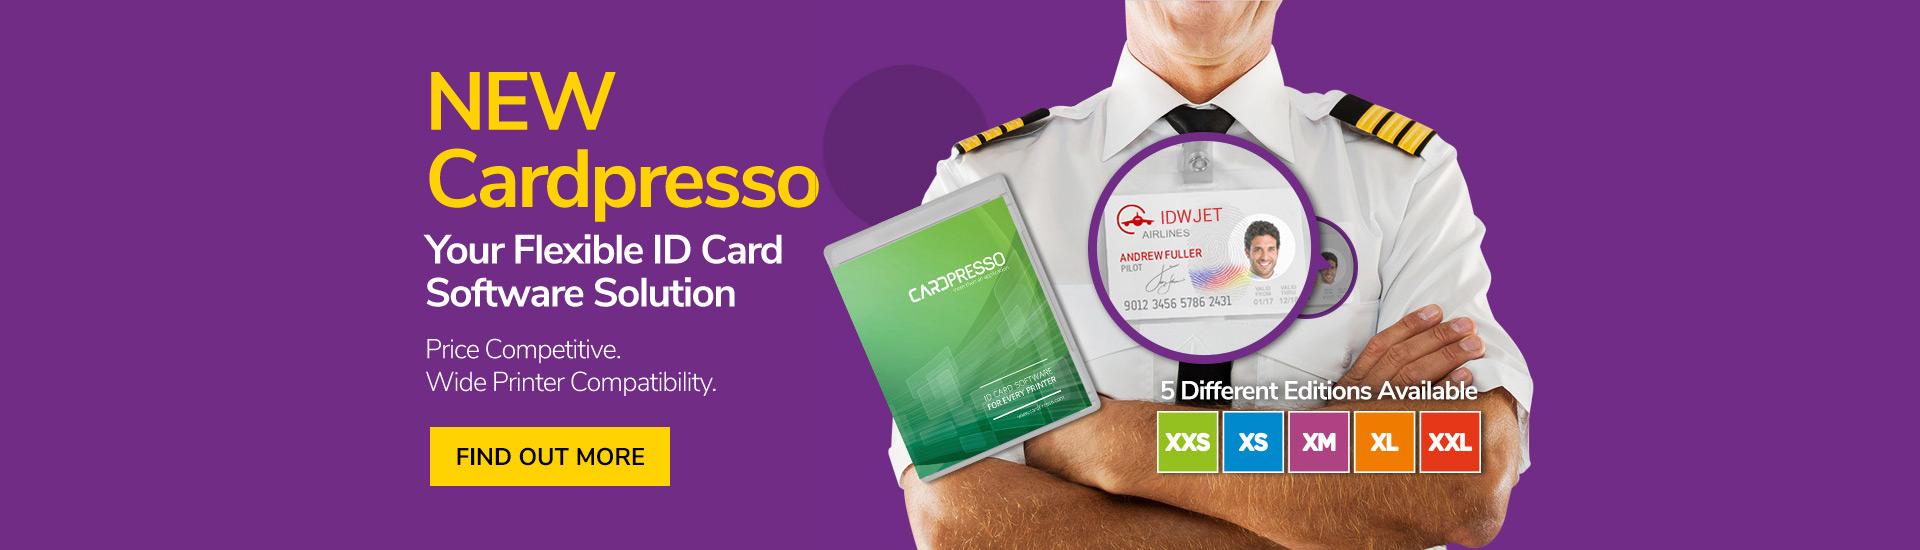 New Cardpresso - Card Printer Design Software Solution